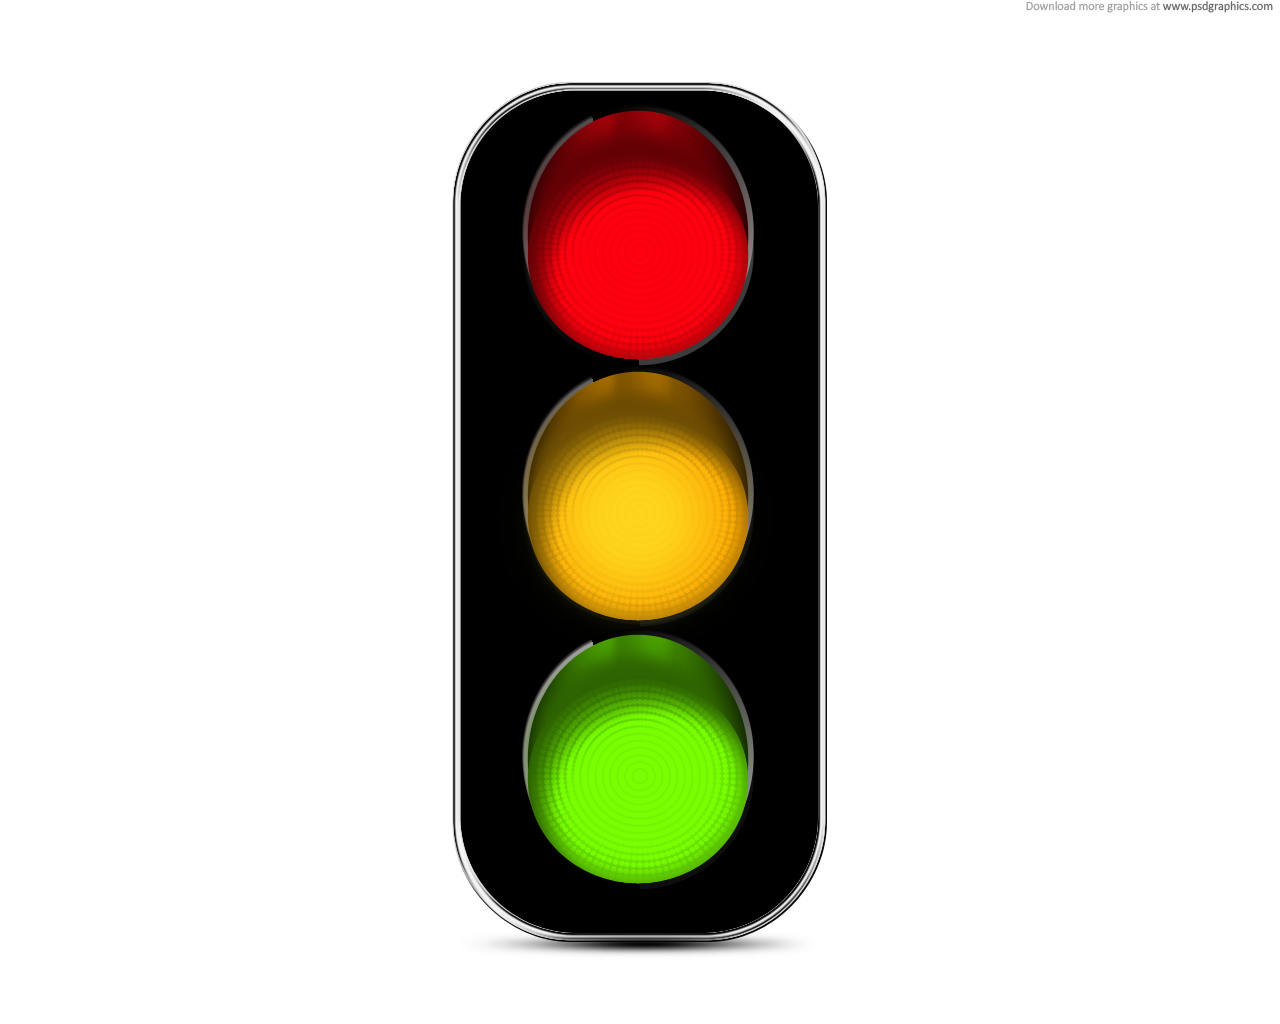 hight resolution of traffic lights icon psd psdgraphics